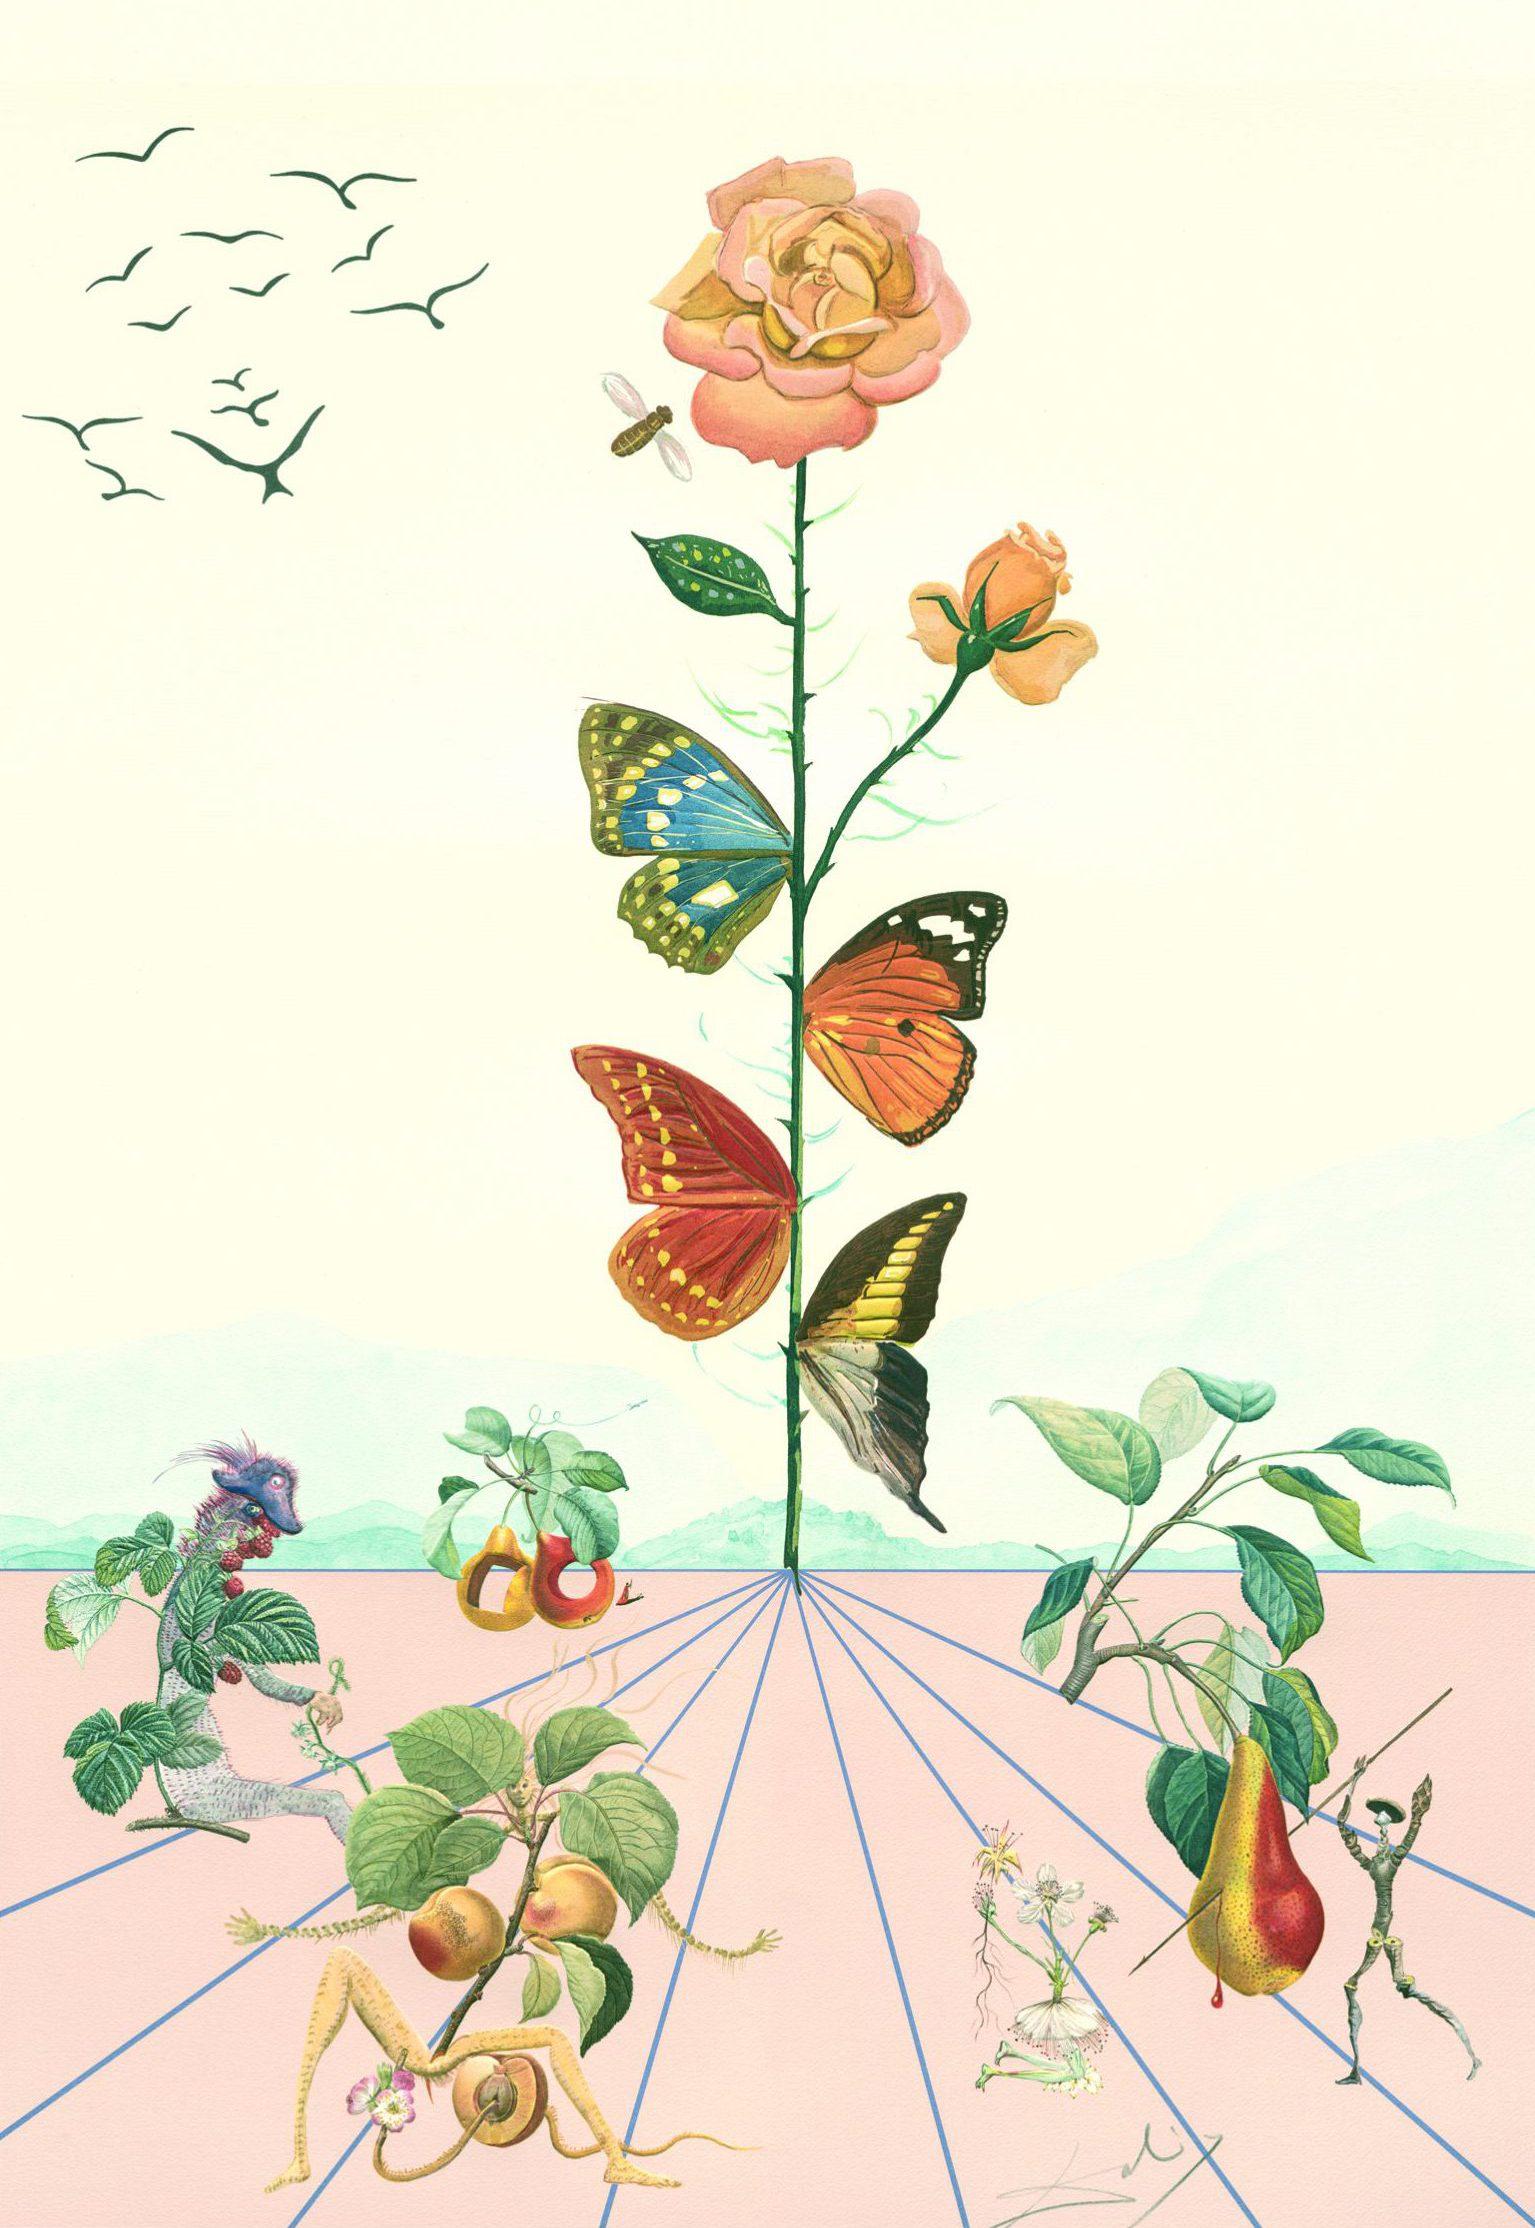 Flordalí II (Flora Dalinea) - Salvador Dalí, Art On Screen - News - [AOS] Magazine